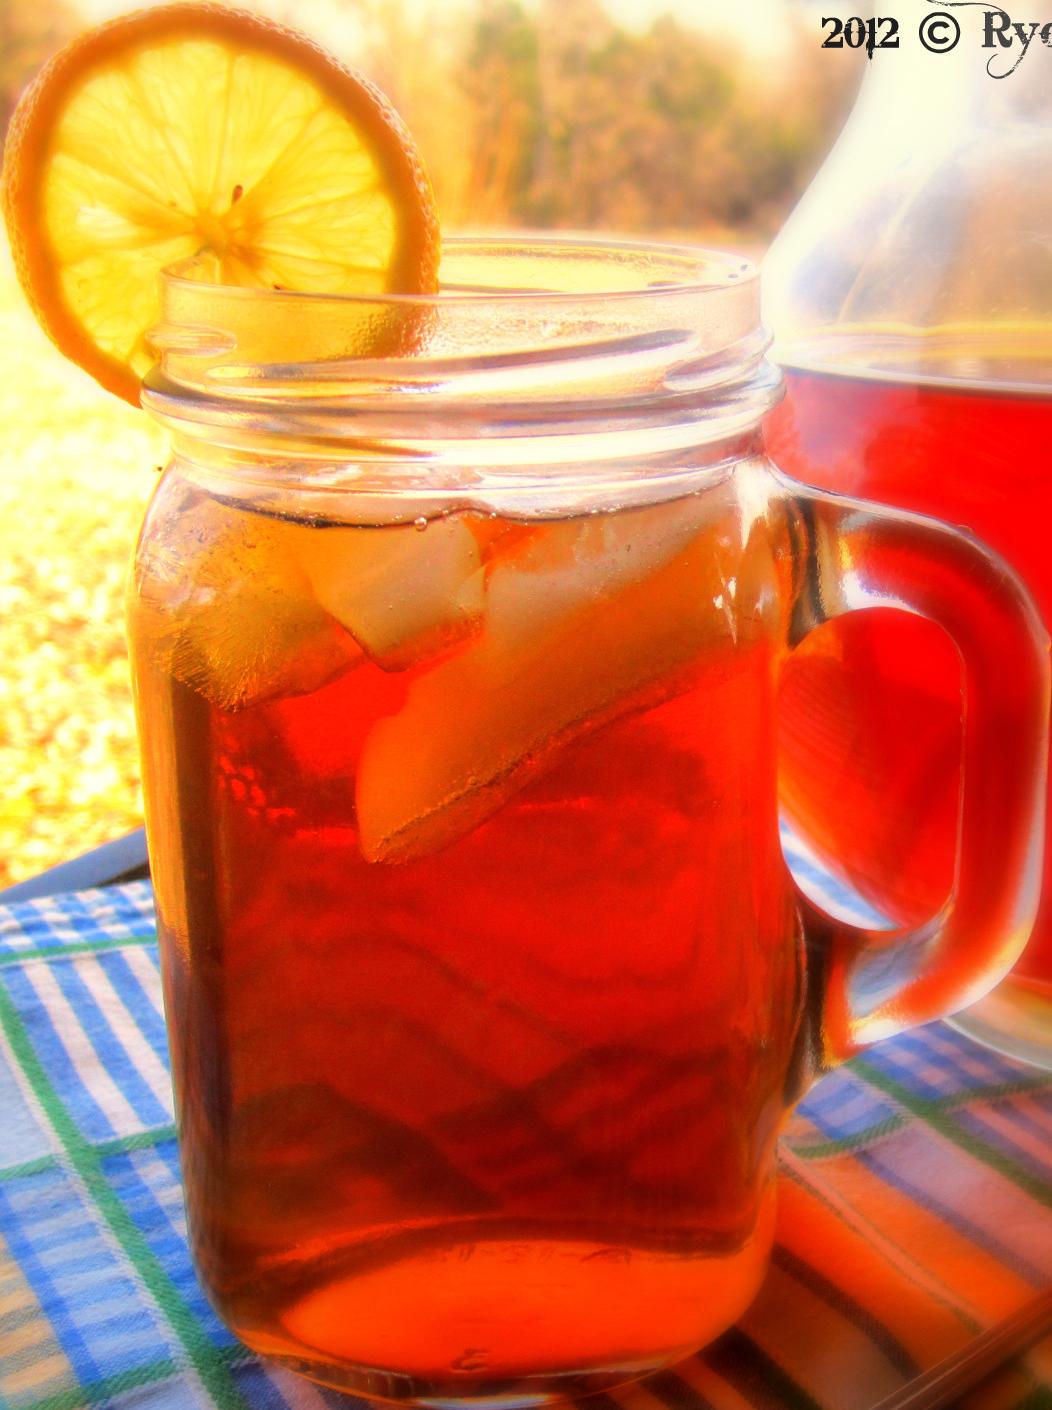 Pics For Gt Iced Tea Pitcher Png Iced Tea Pitcher Iced Tea Tea